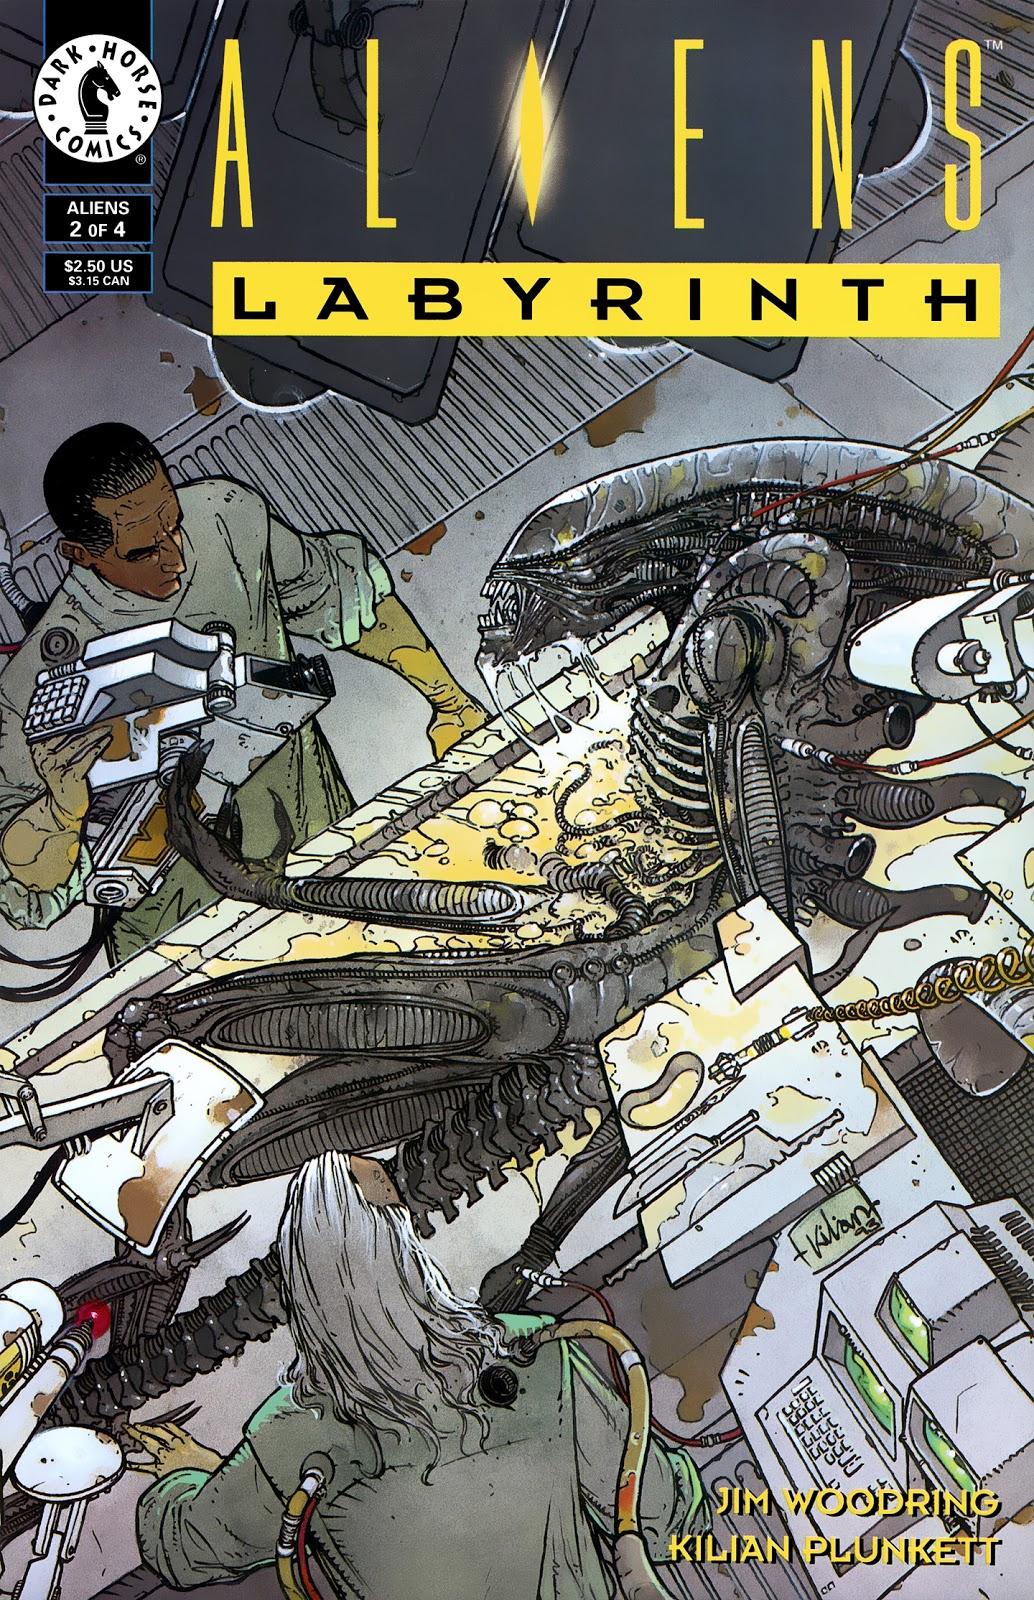 File:180px-367328-21239-128539-1-aliens-labyrinth super.jpg